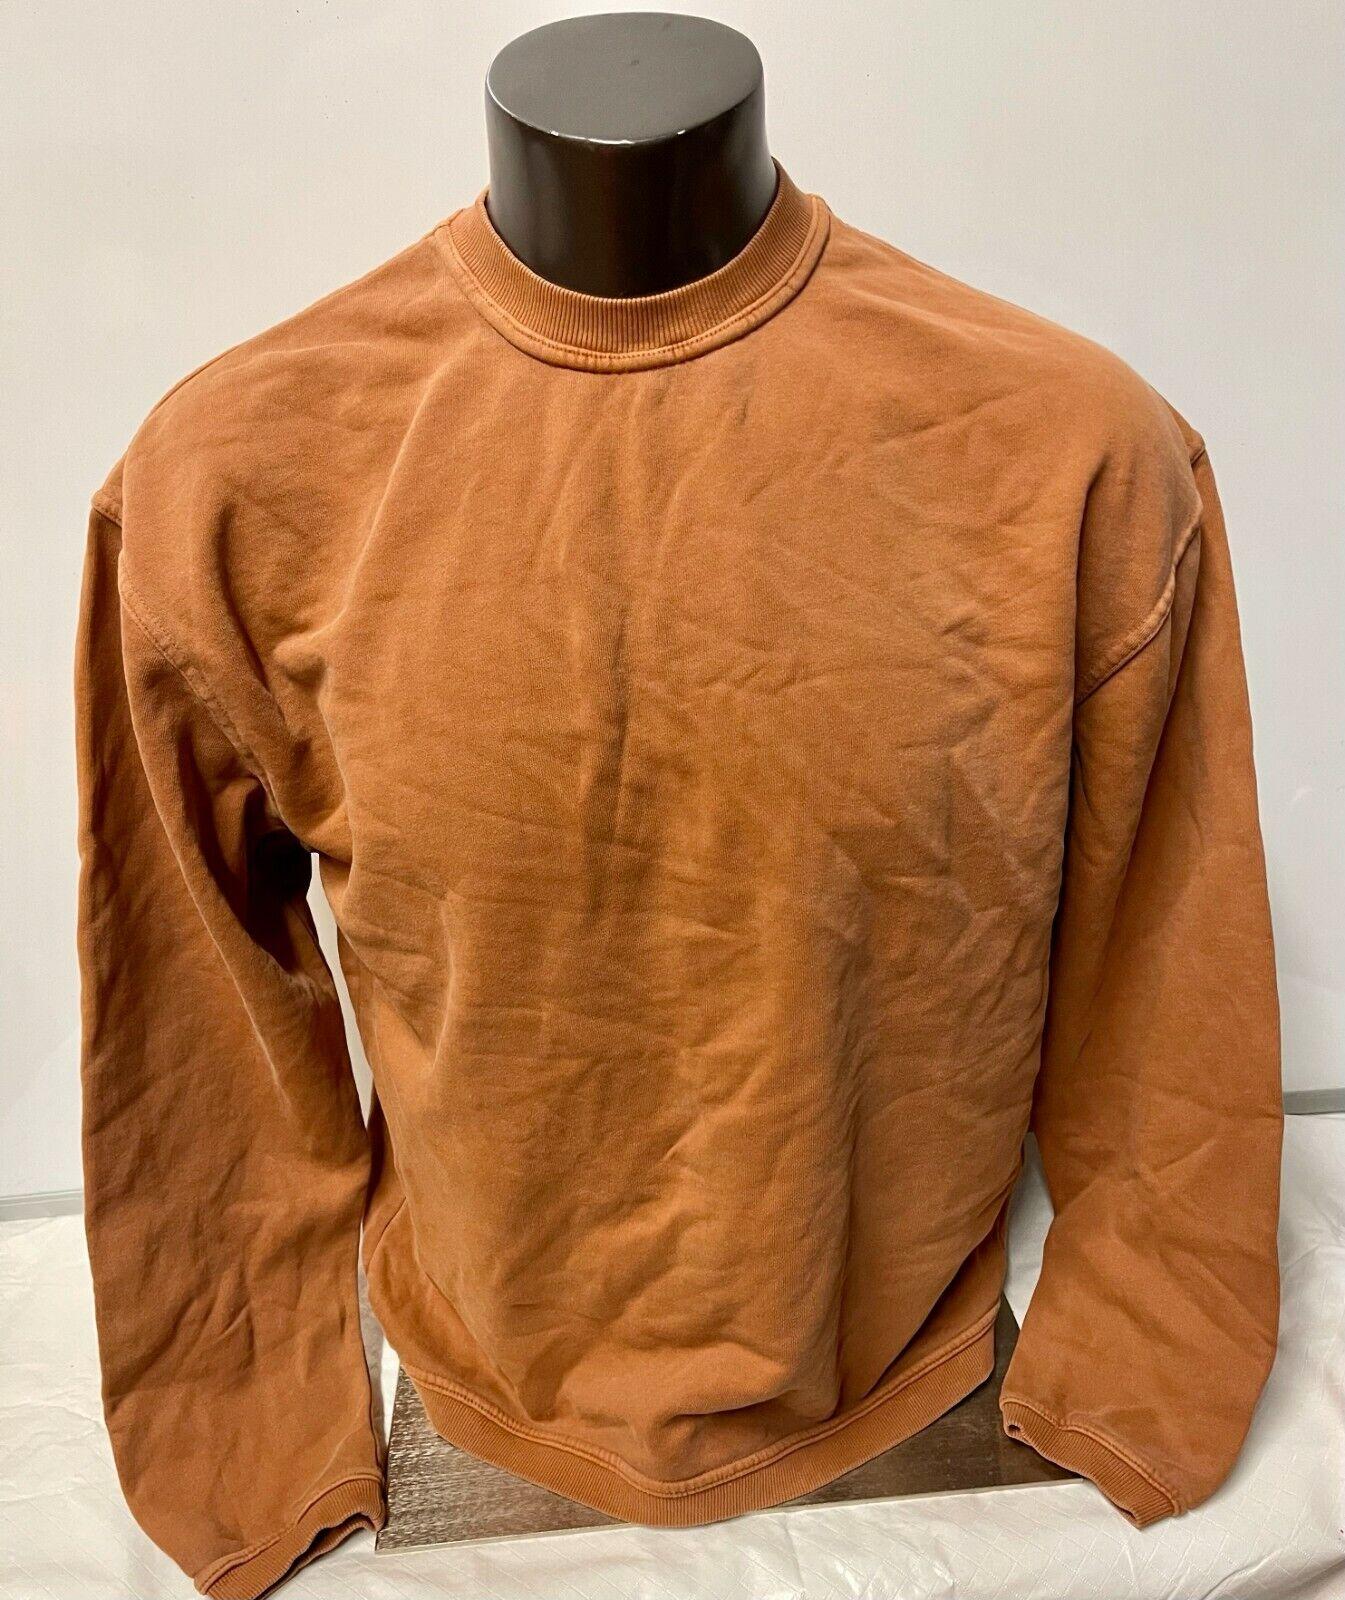 Authentic Pigment Men's Sweatshirt Crew styl Long Sleeves Size Medium